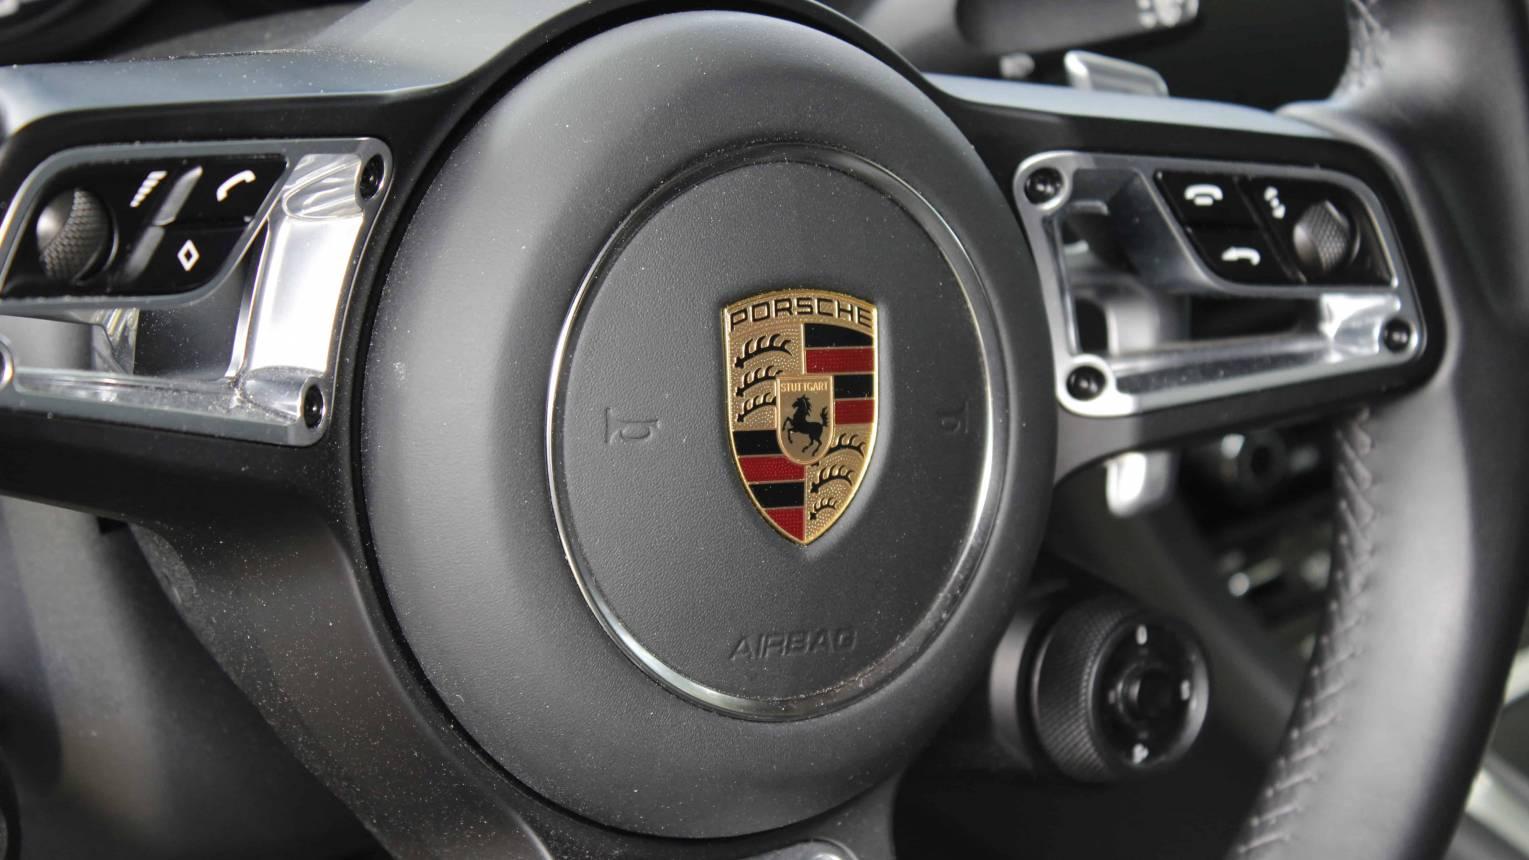 Porsche 911 Carrera S vezetés a DRX-ringen